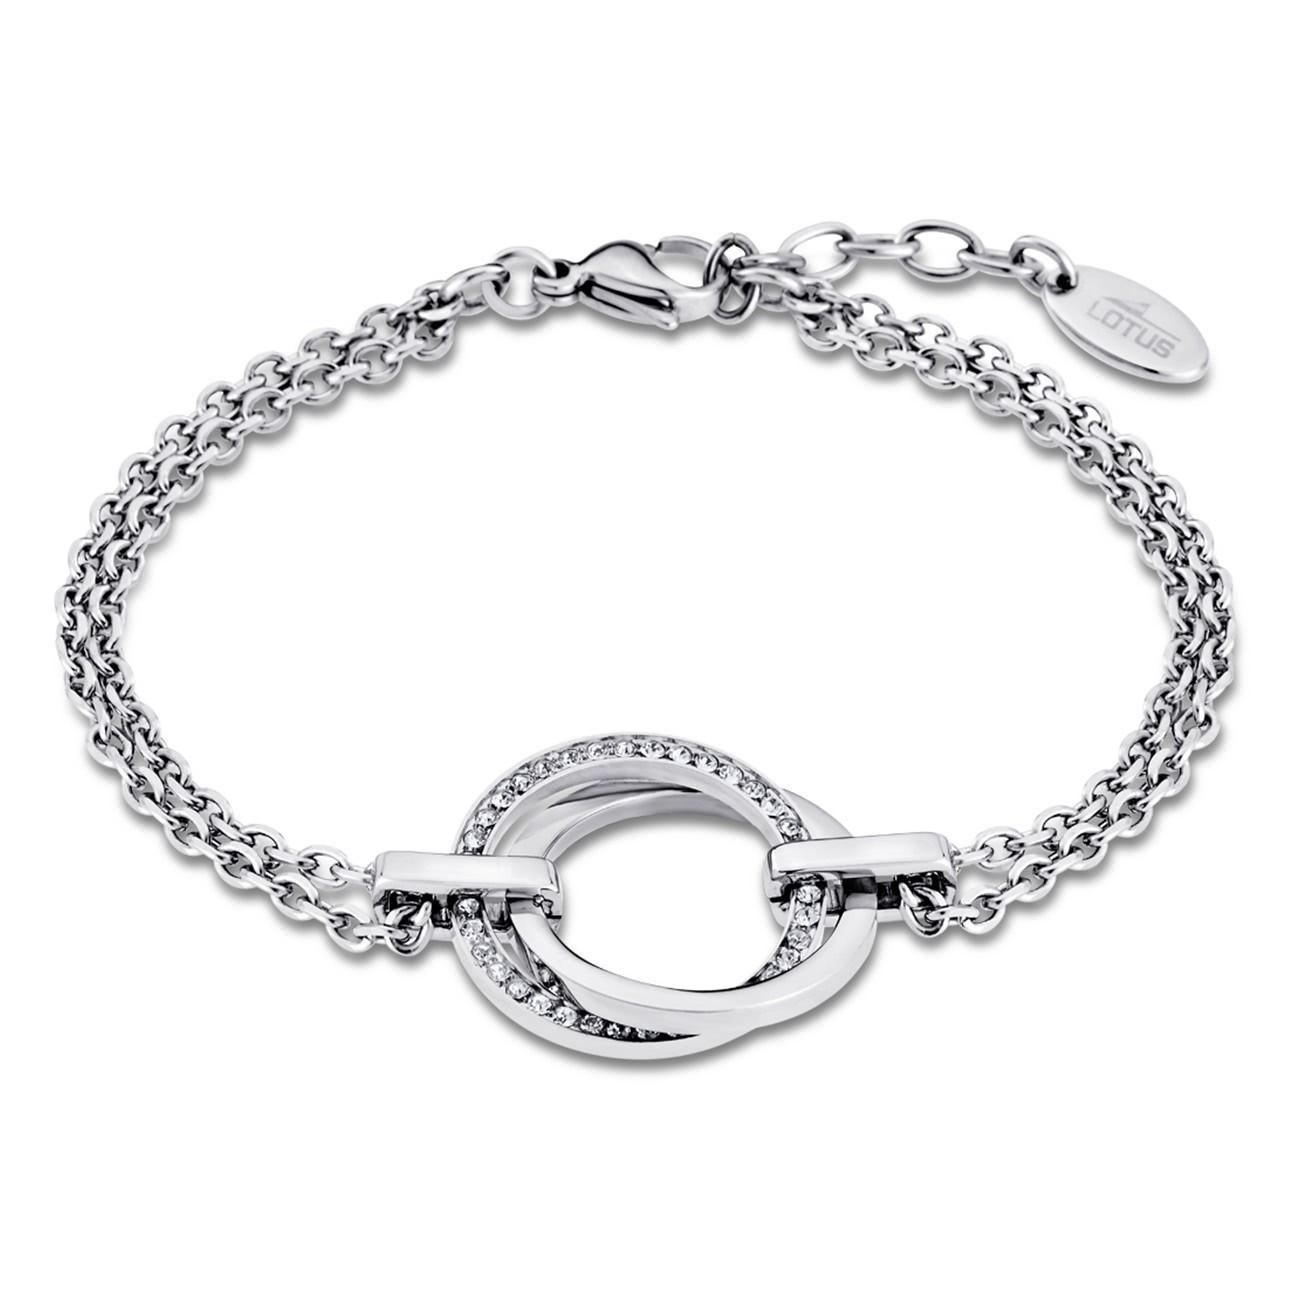 LOTUS Style Armband Damen Edelstahl silber LS1780-2/1 Privilege JLS1780-2-1